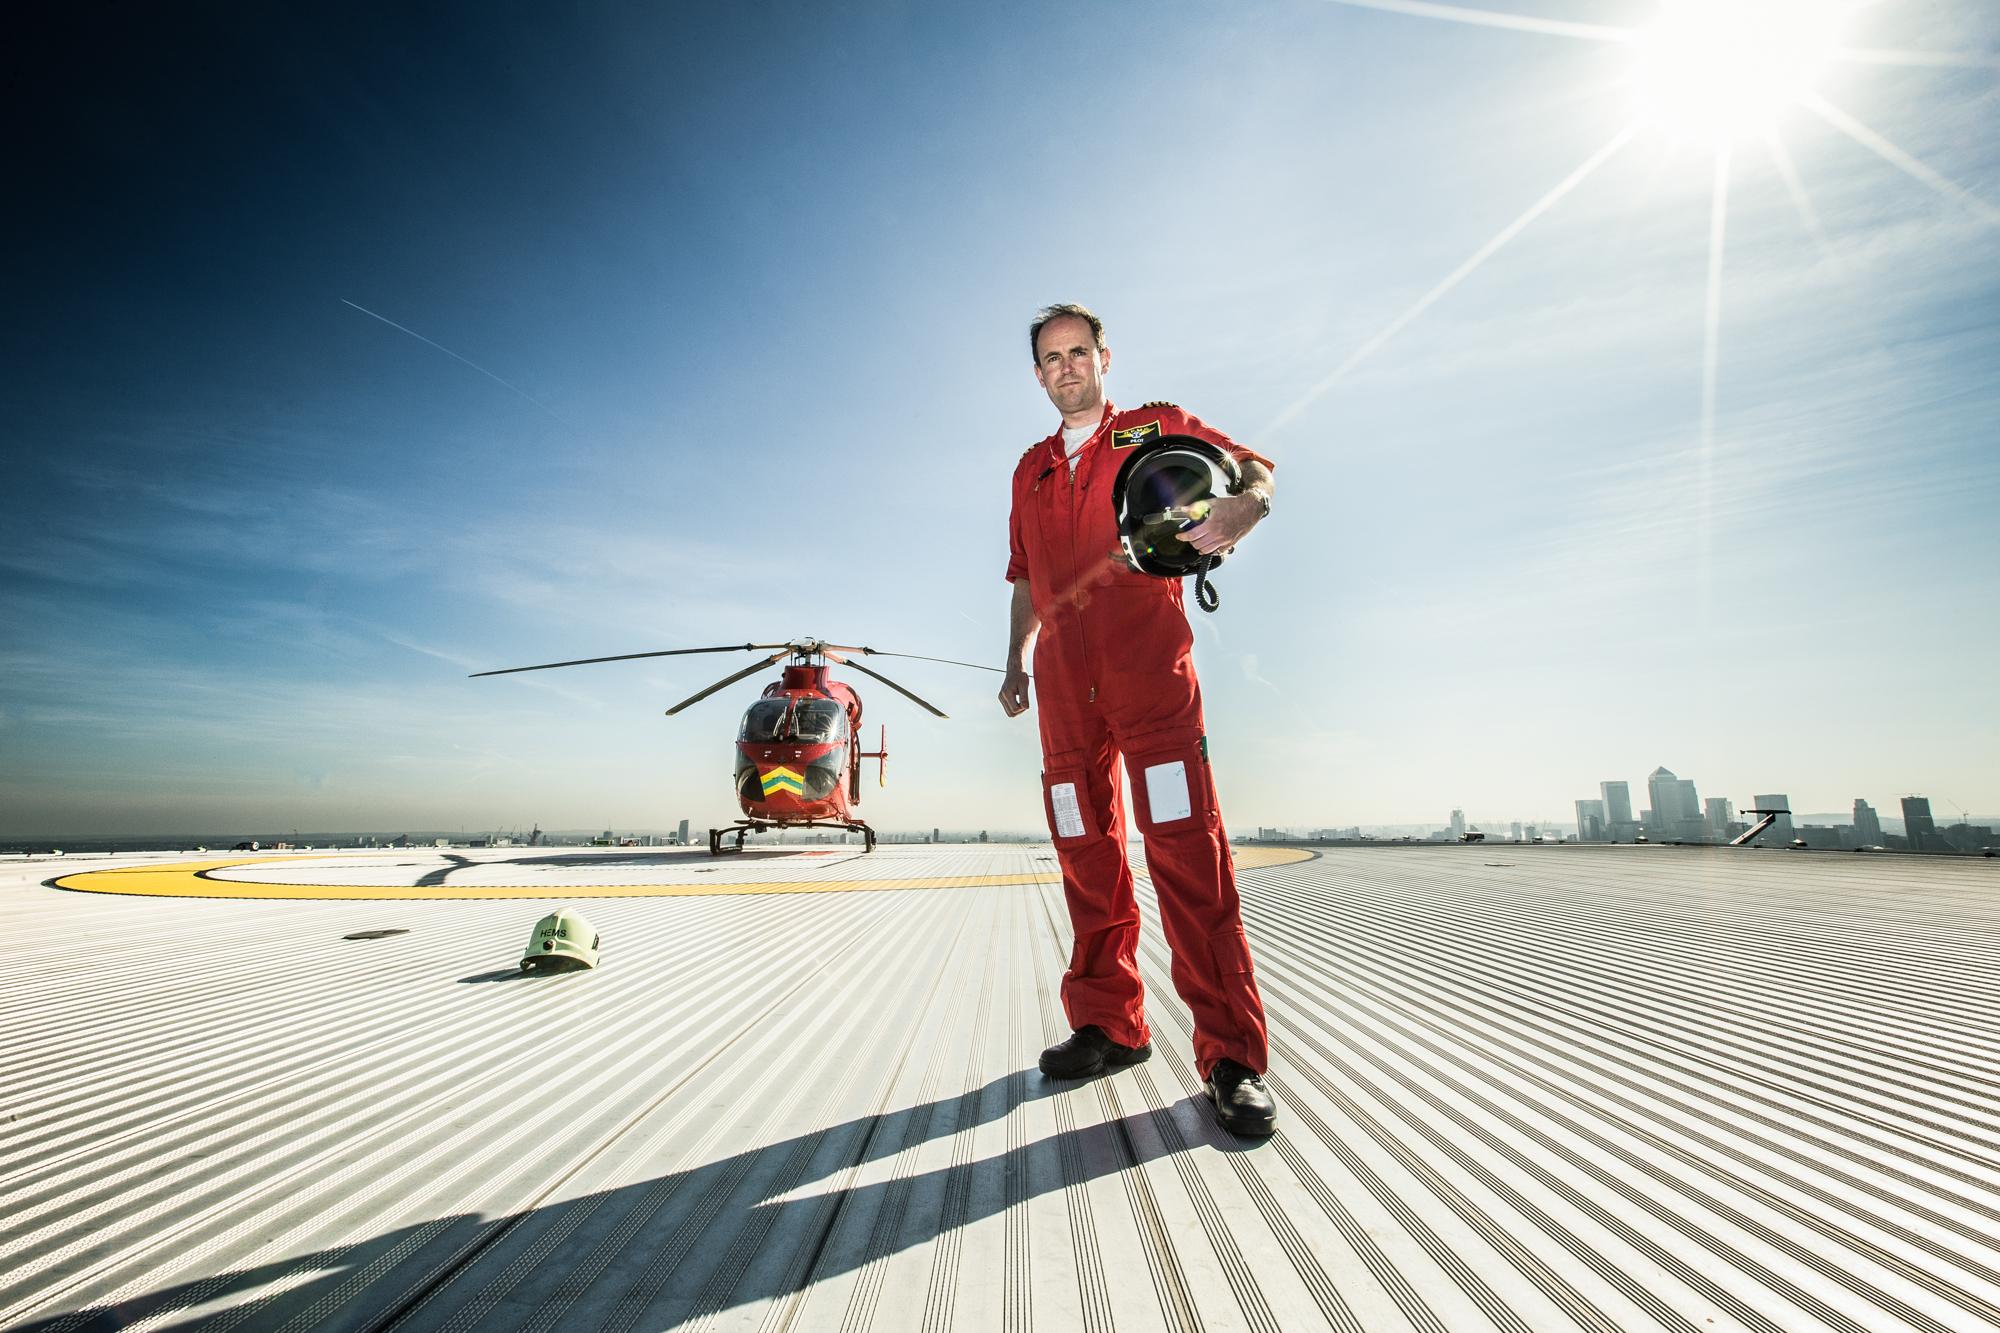 london-air-ambulance-13.jpg